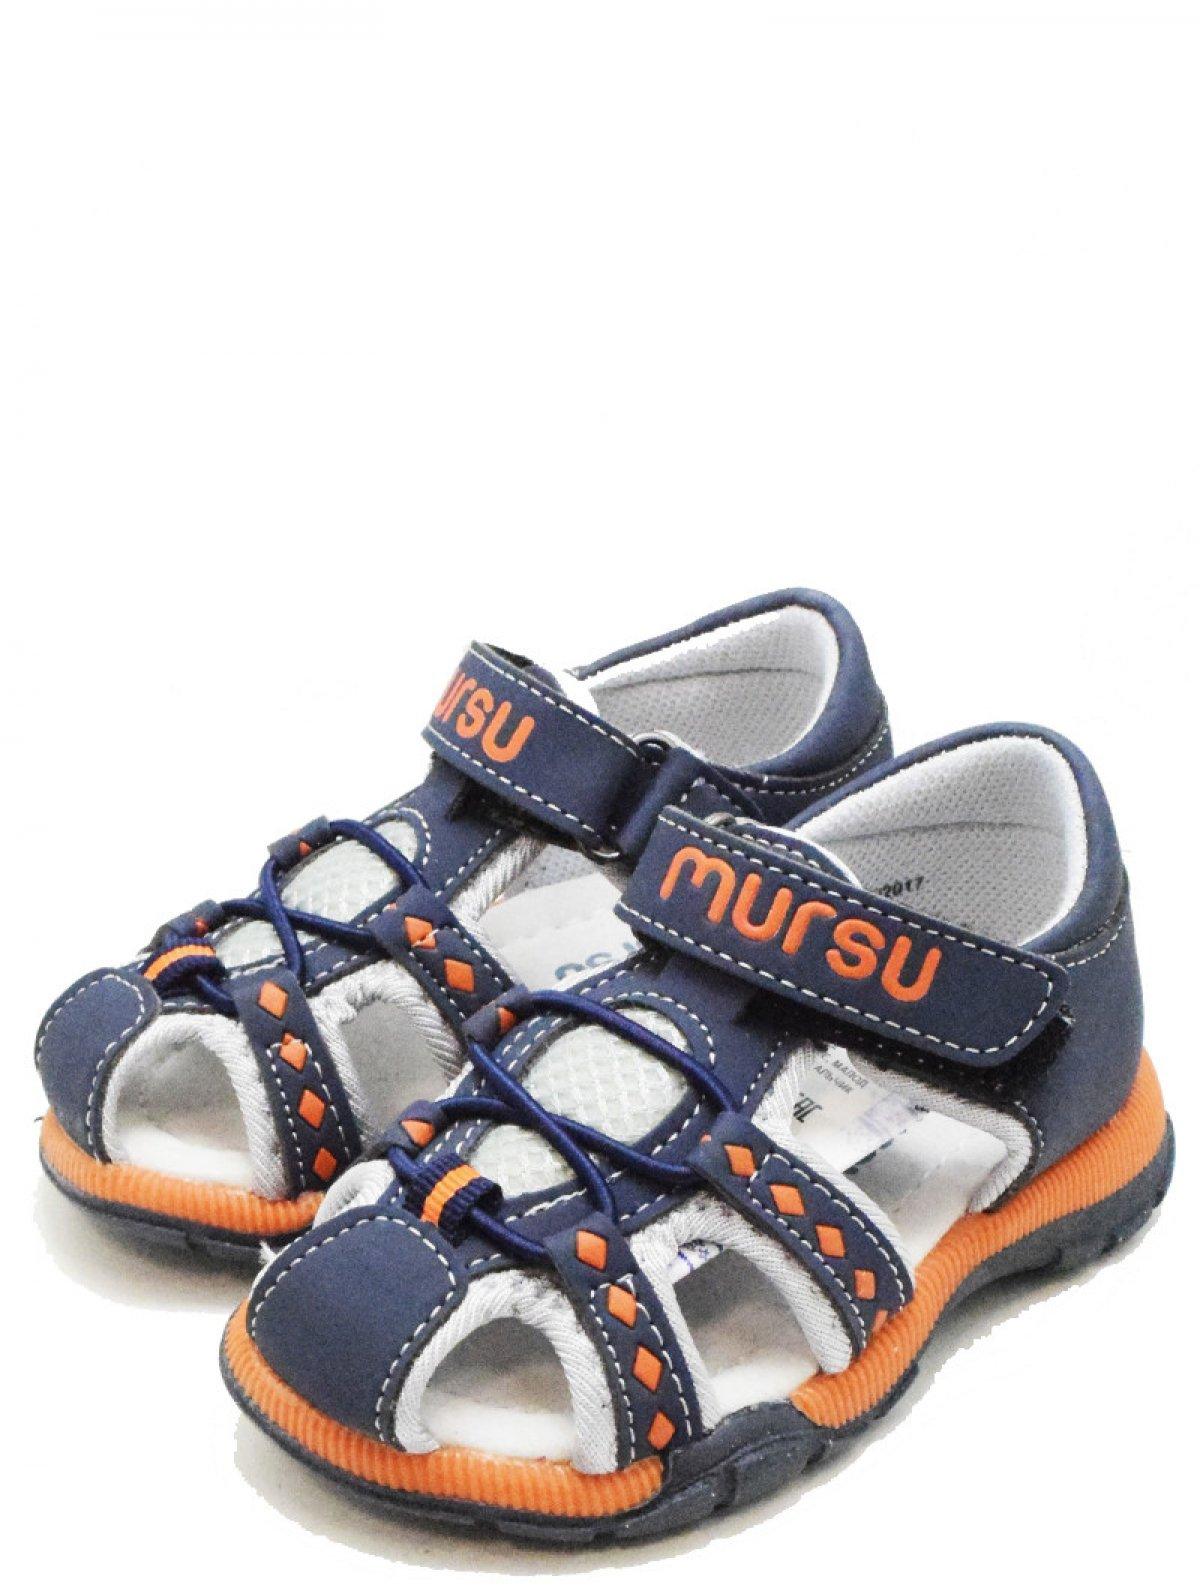 Mursu 203392 сандали для мальчика